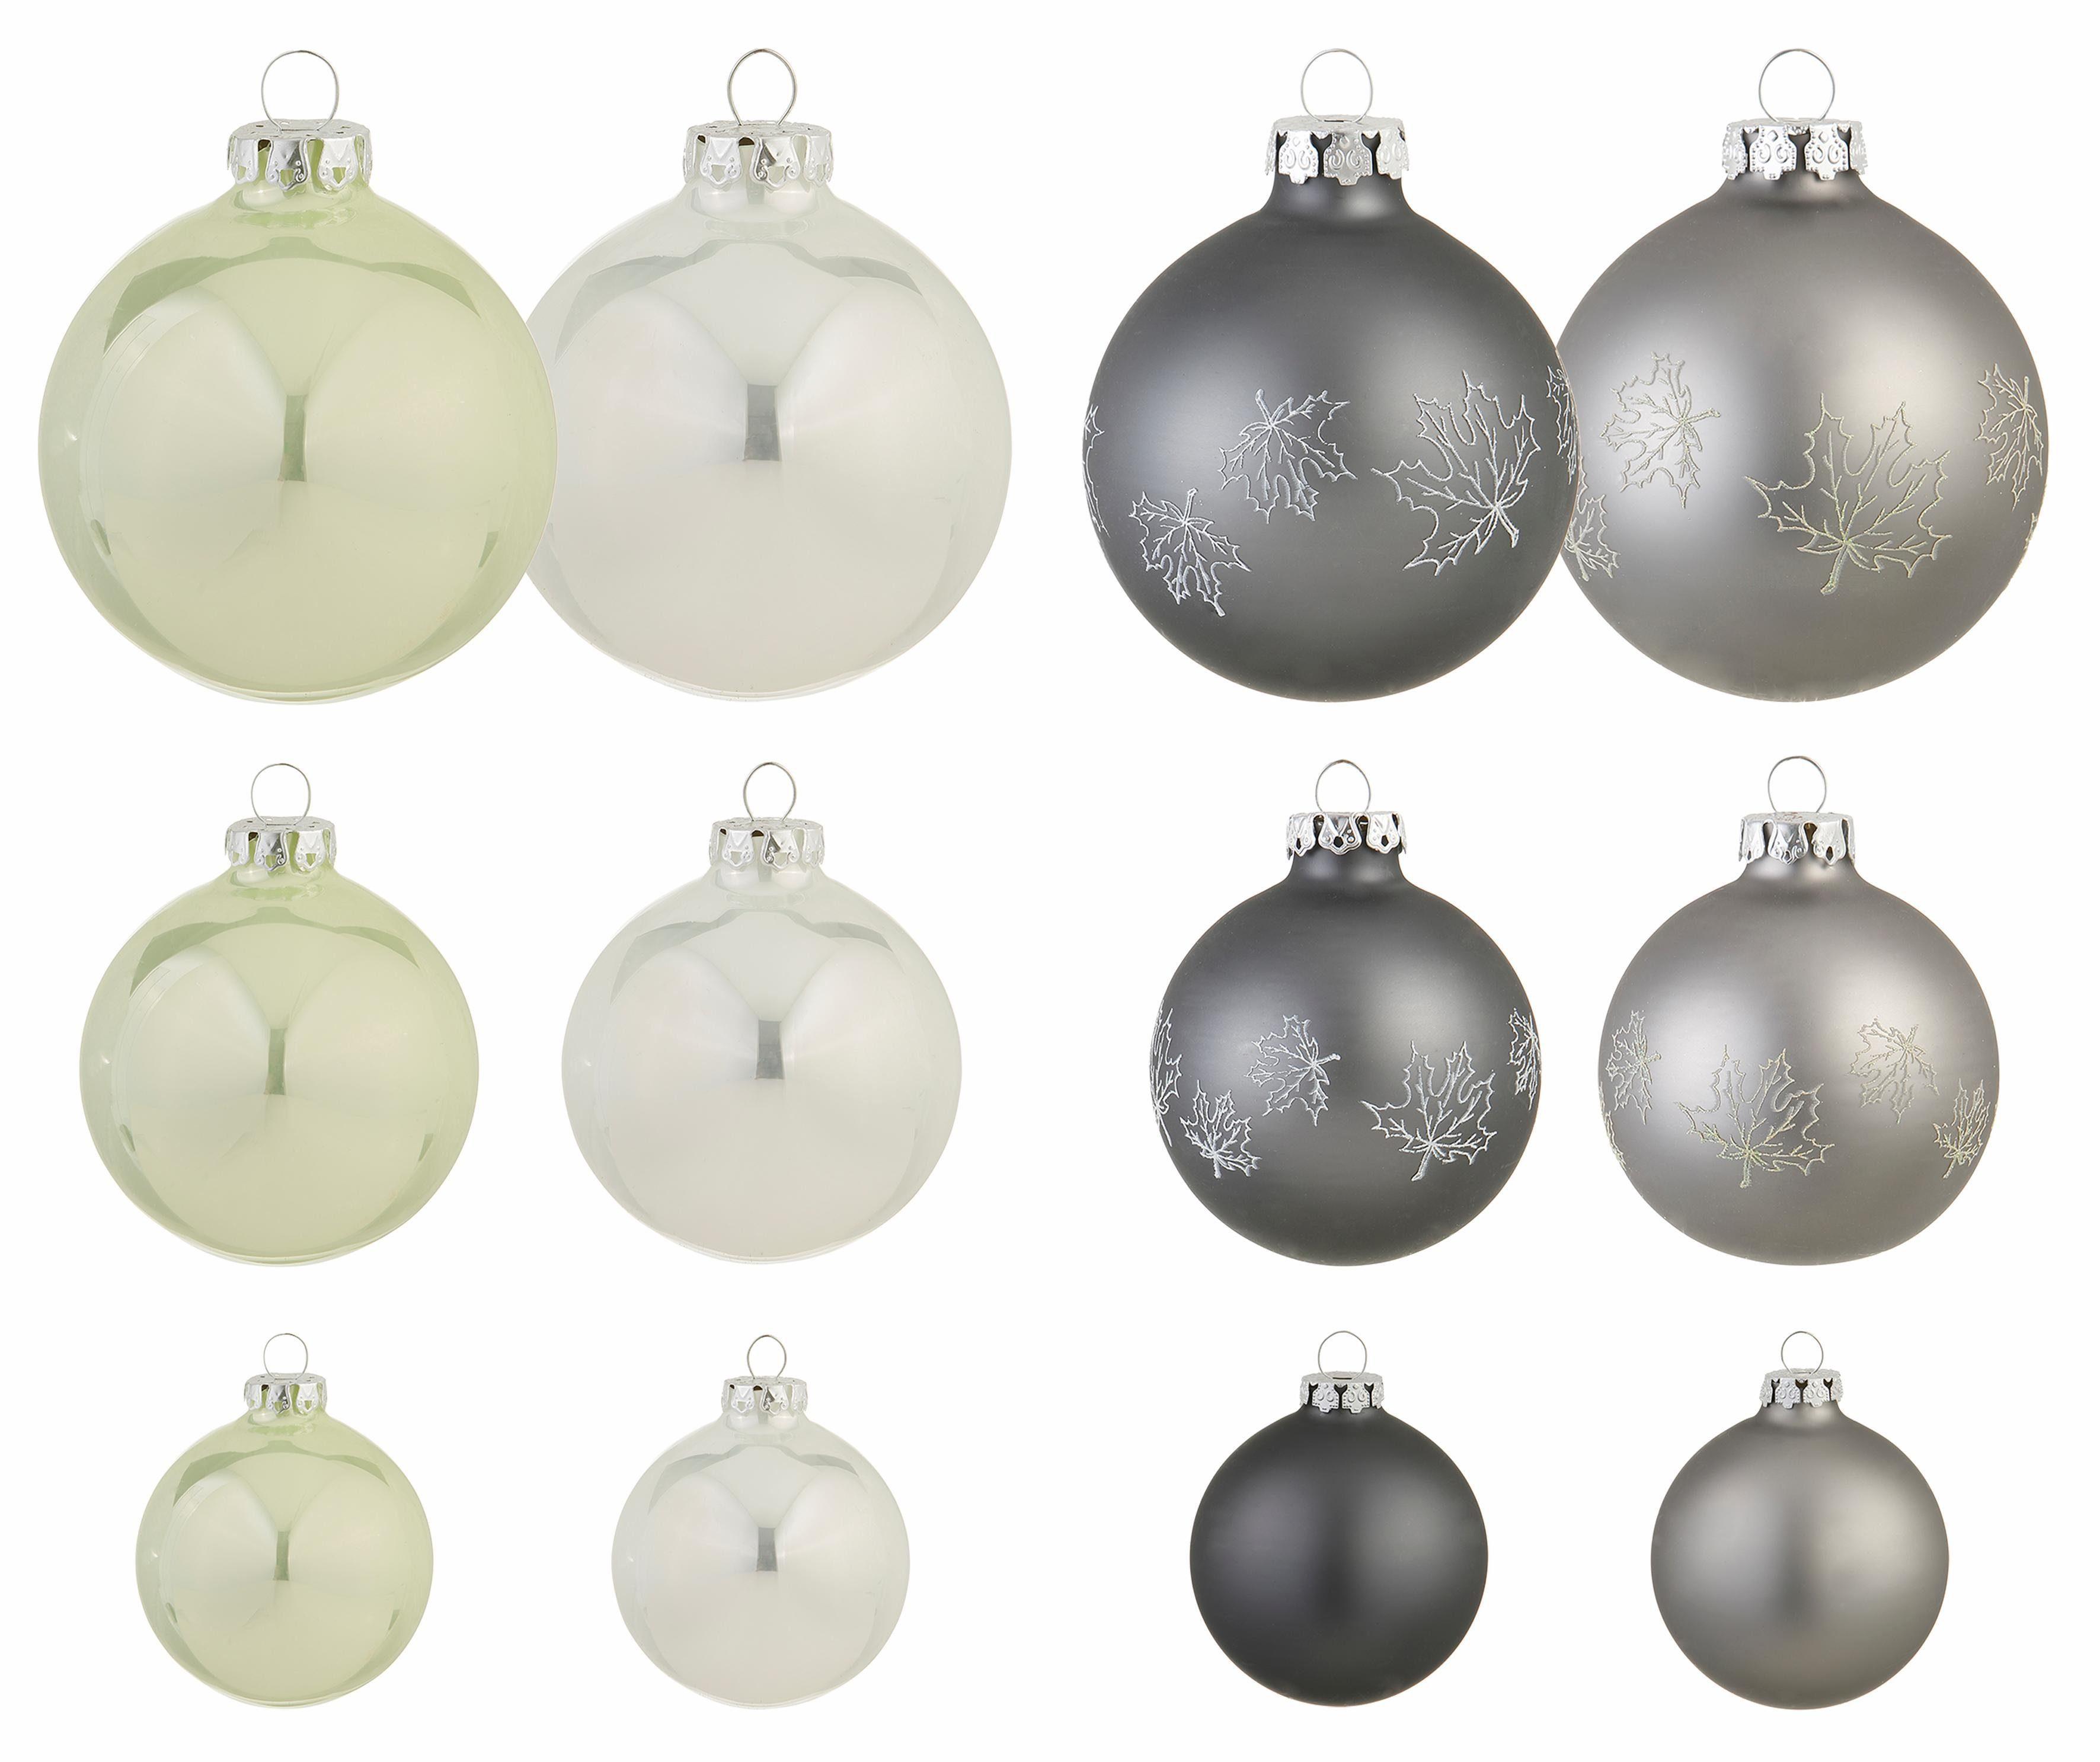 Thüringer Glasdesign TGS-Weihnachtskugeln, Made in Germany, (30-teilig.), »Frozen Christmas«